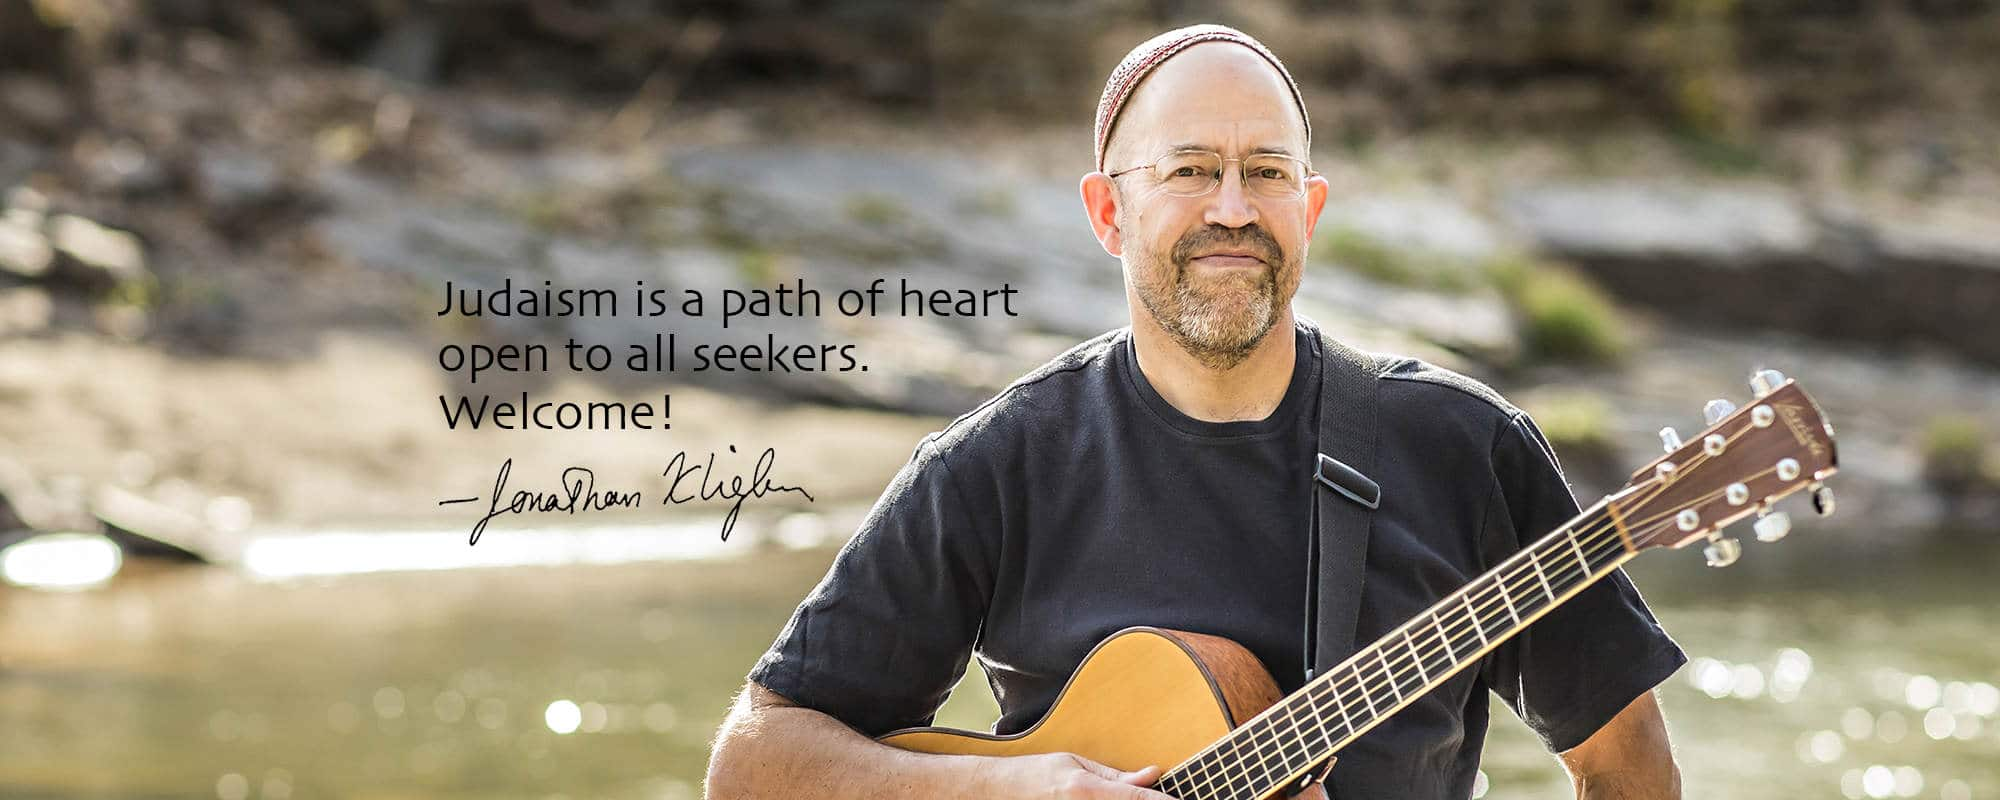 rabbi jonathan kligler - welcome | rabbijonathankligler.com